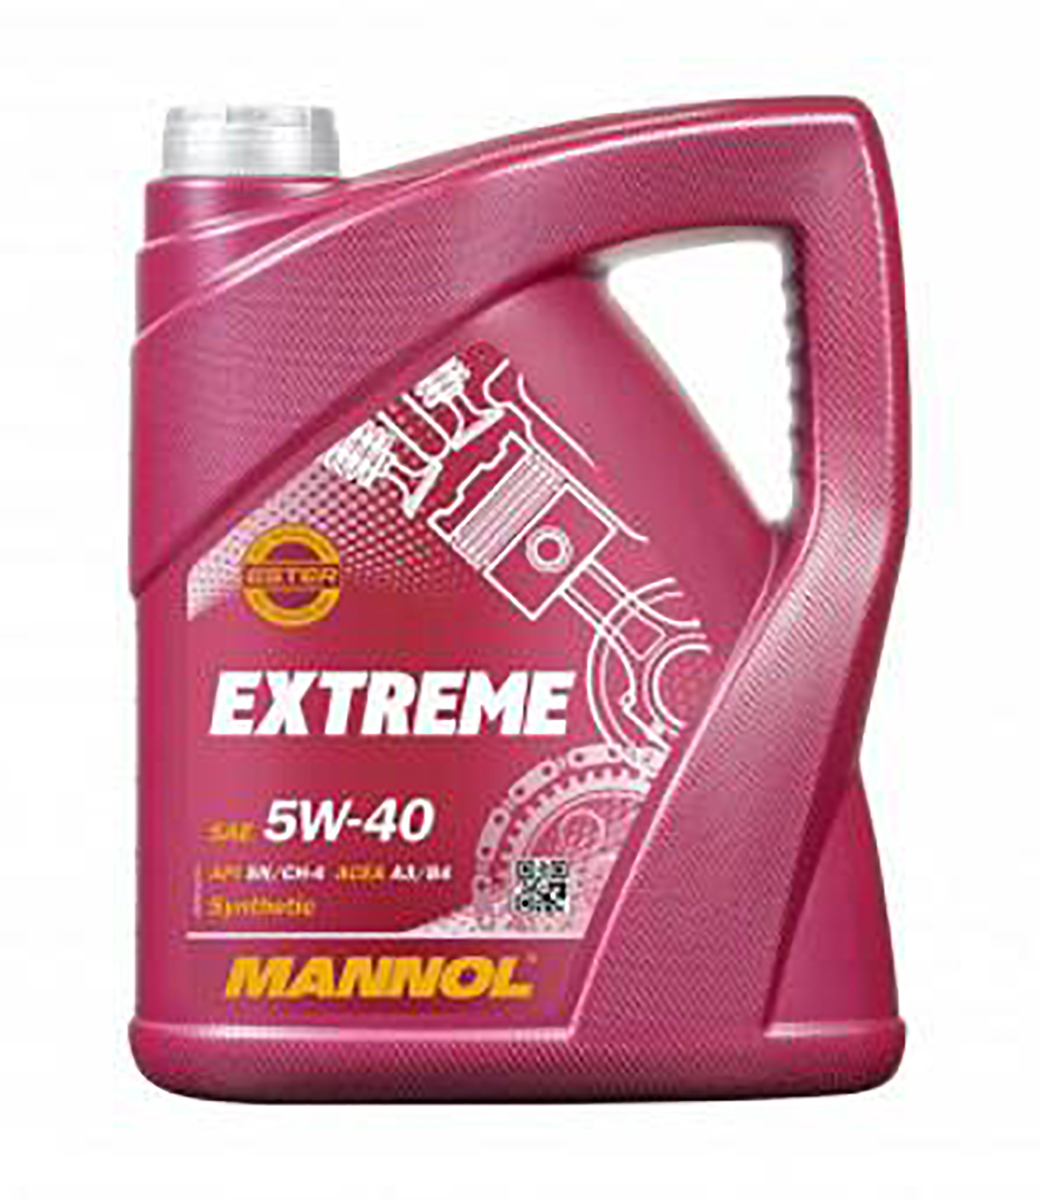 Extreme 5W-40